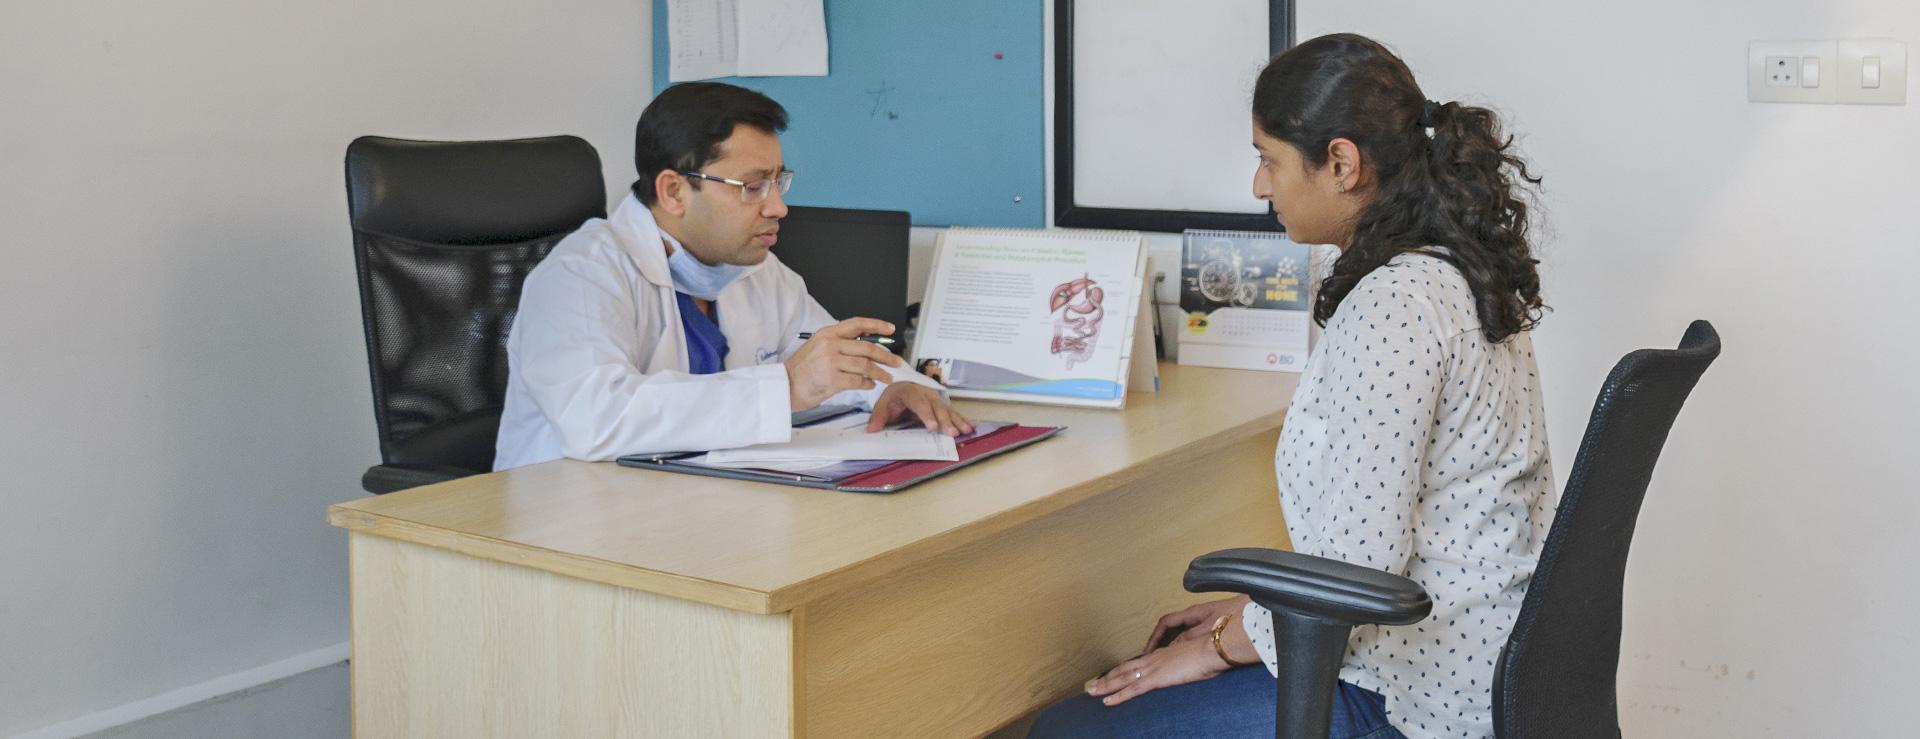 Bariatric Surgeries